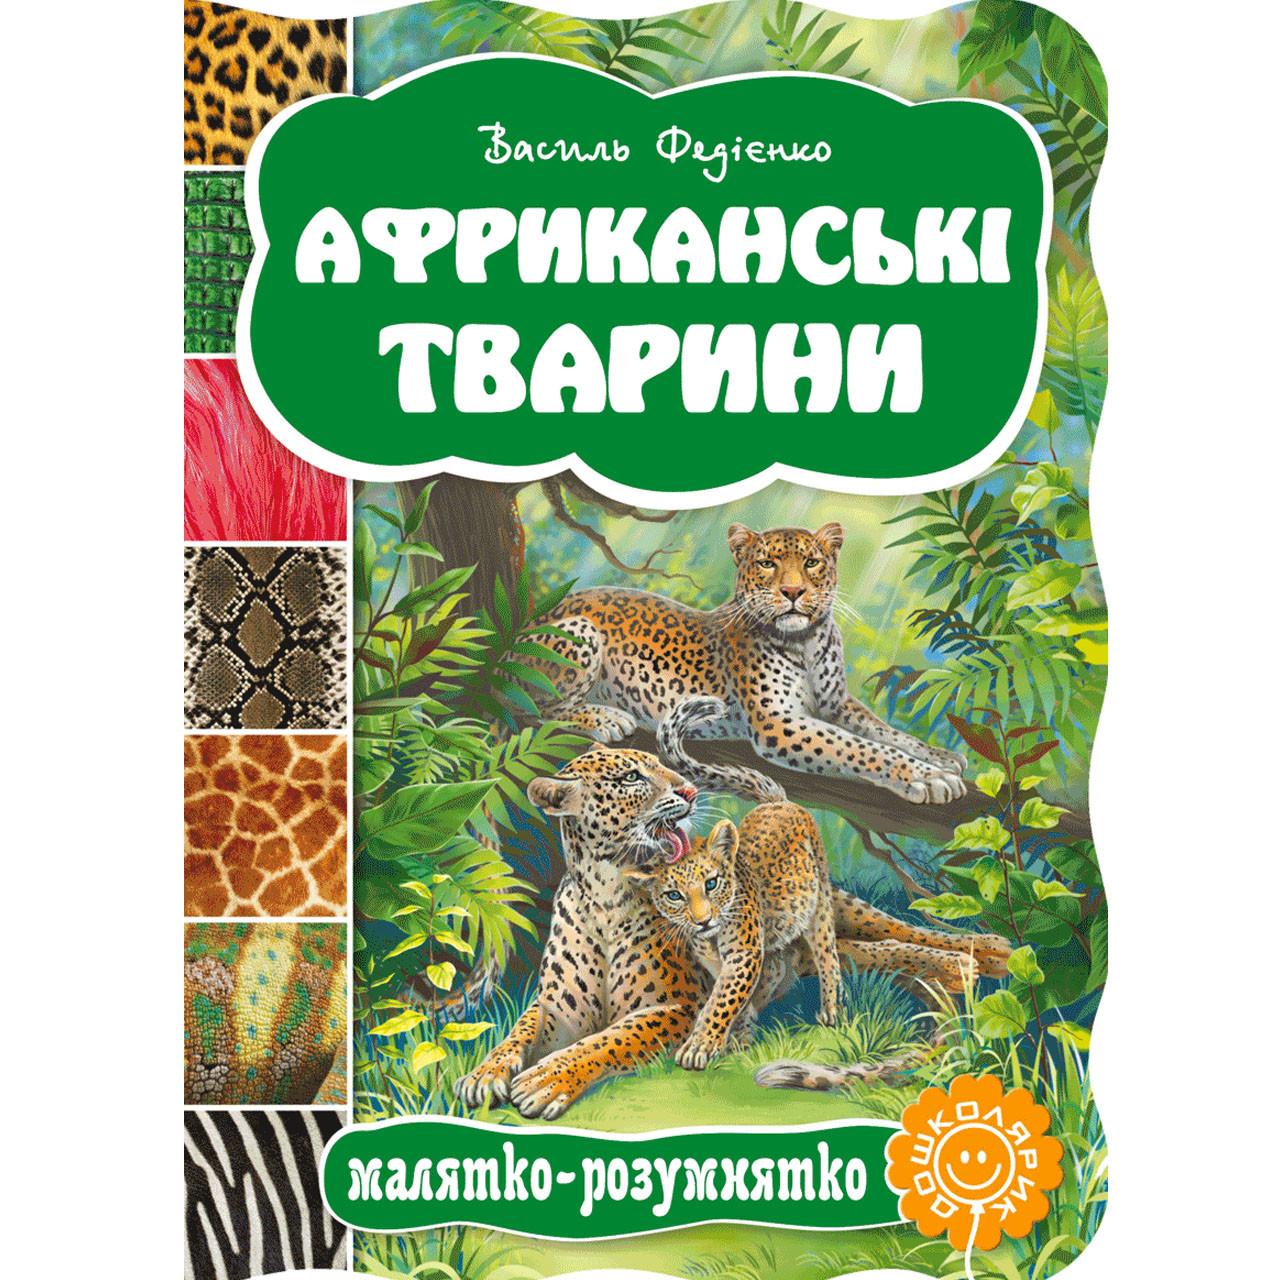 Книжка-картонка Малятко-розумнятко Африканські тварини Авт: Федієнко В. Вид: Школа